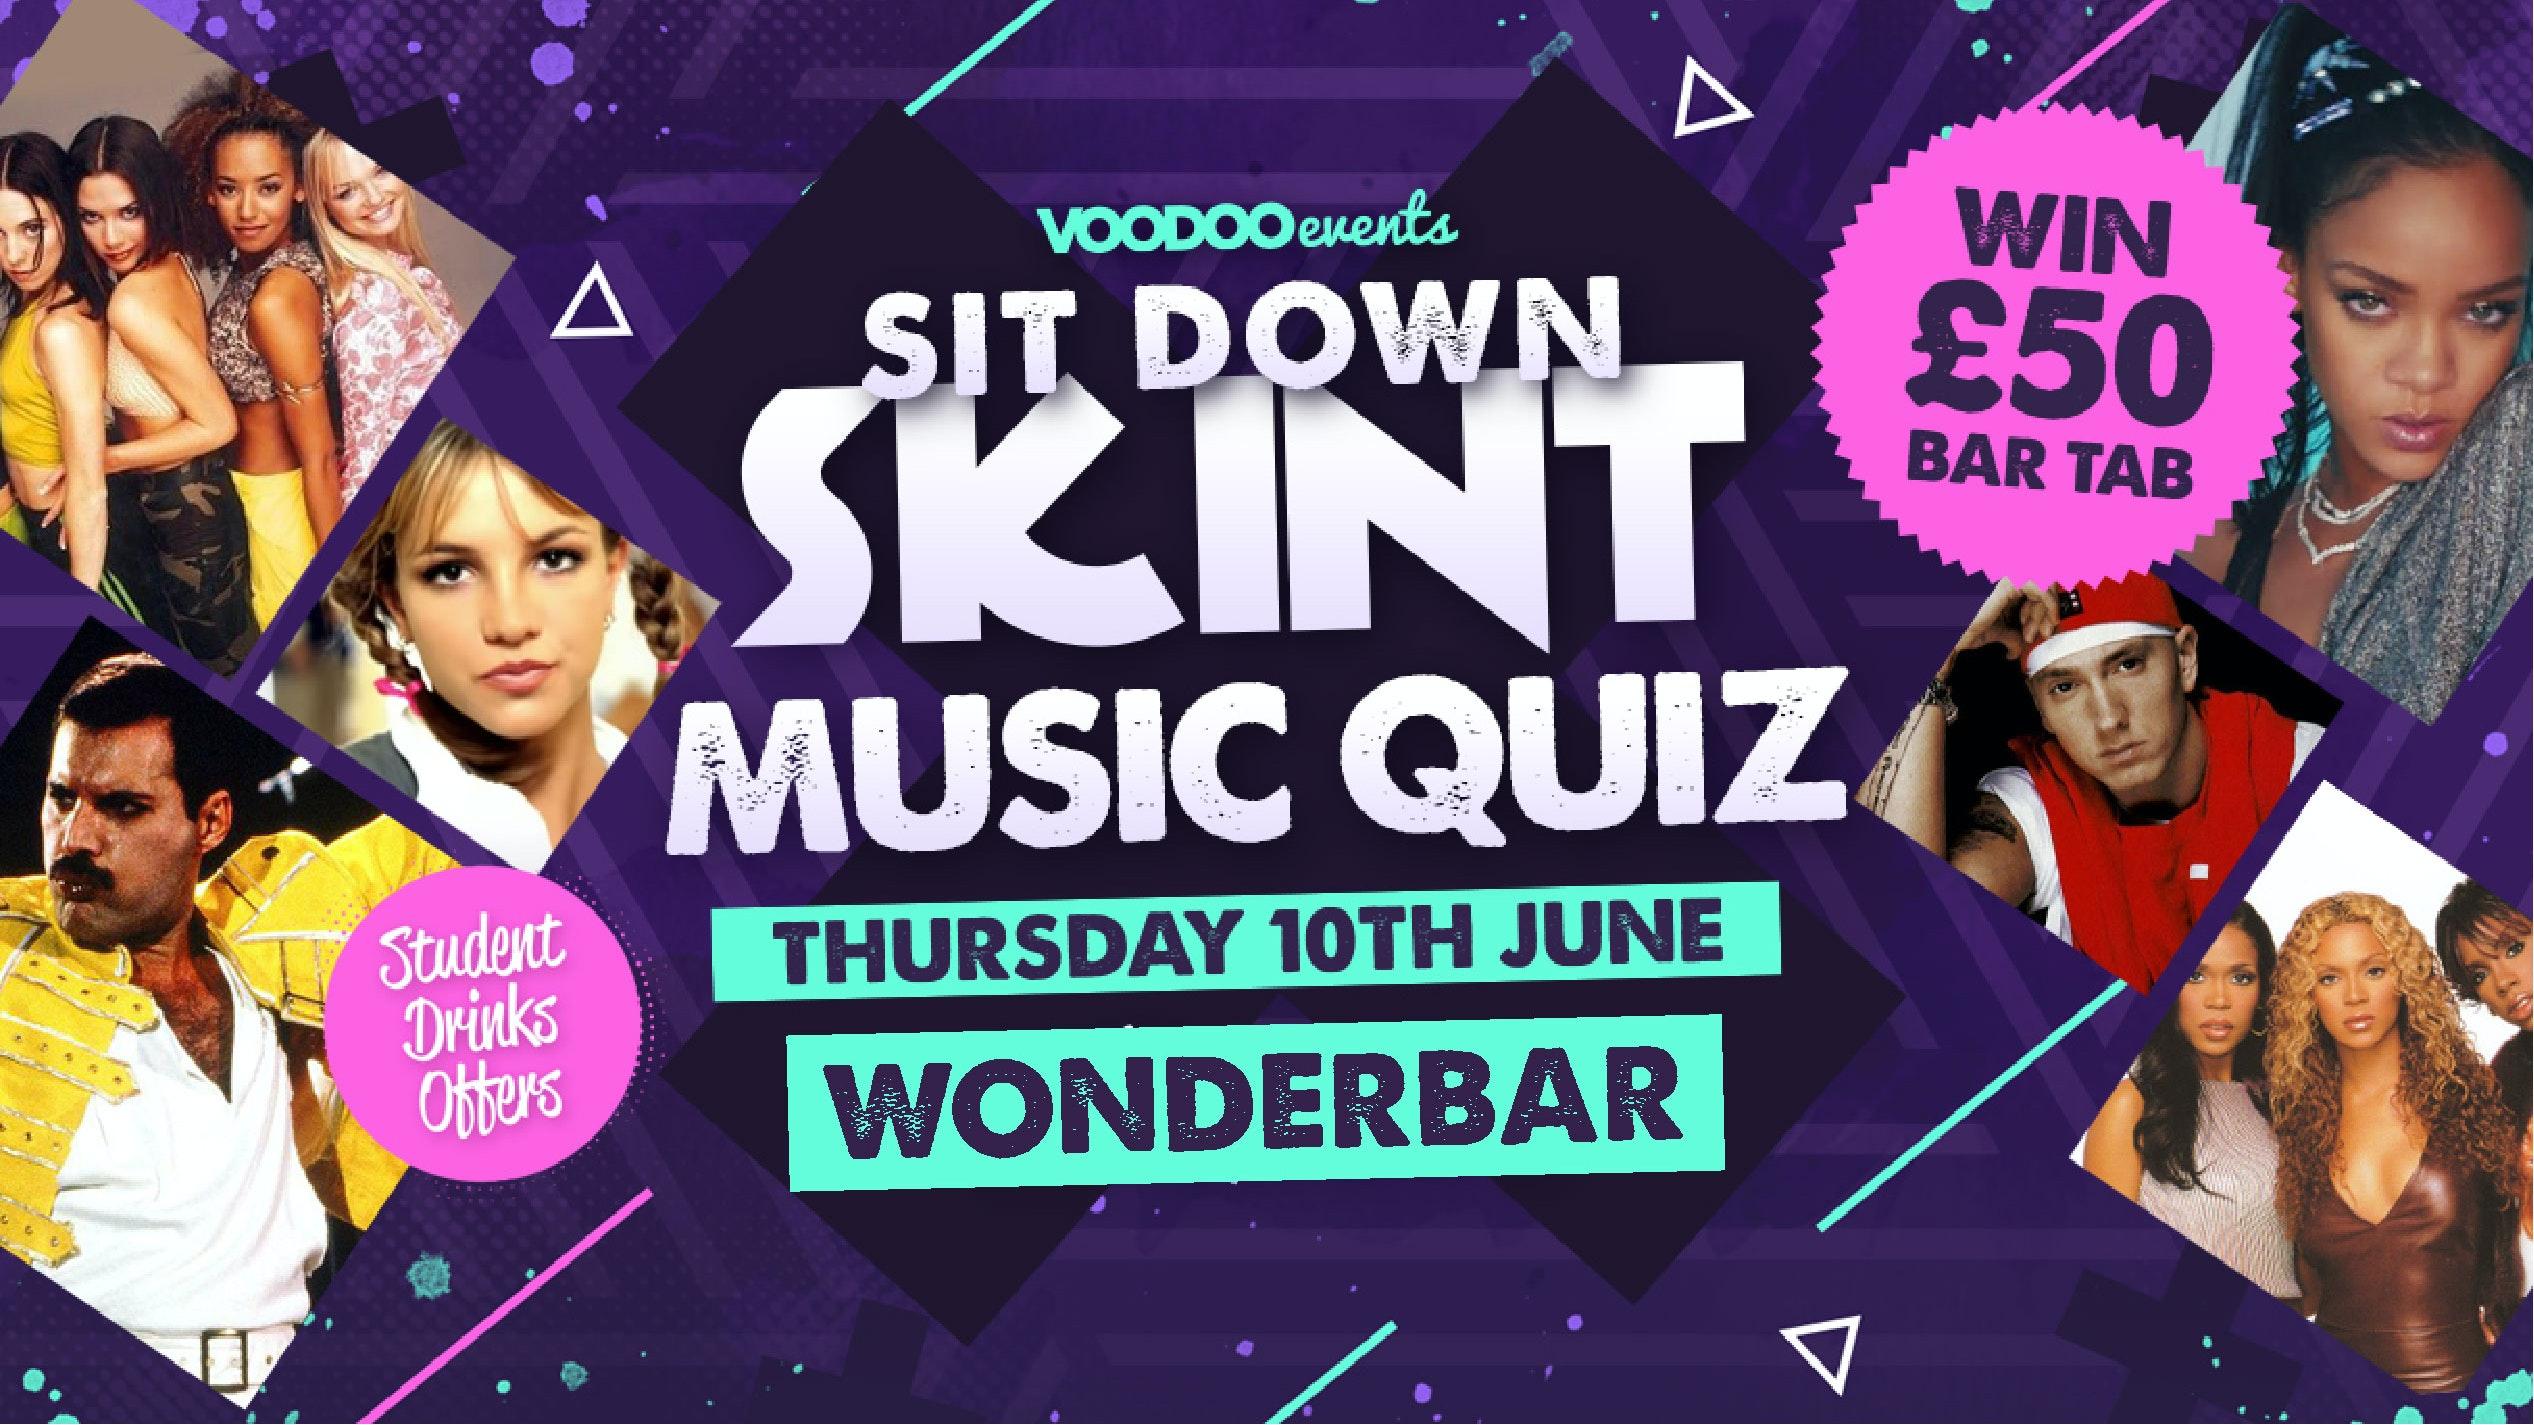 Sit Down Skint – Music Quiz!! – NOW AT WONDERBAR!!